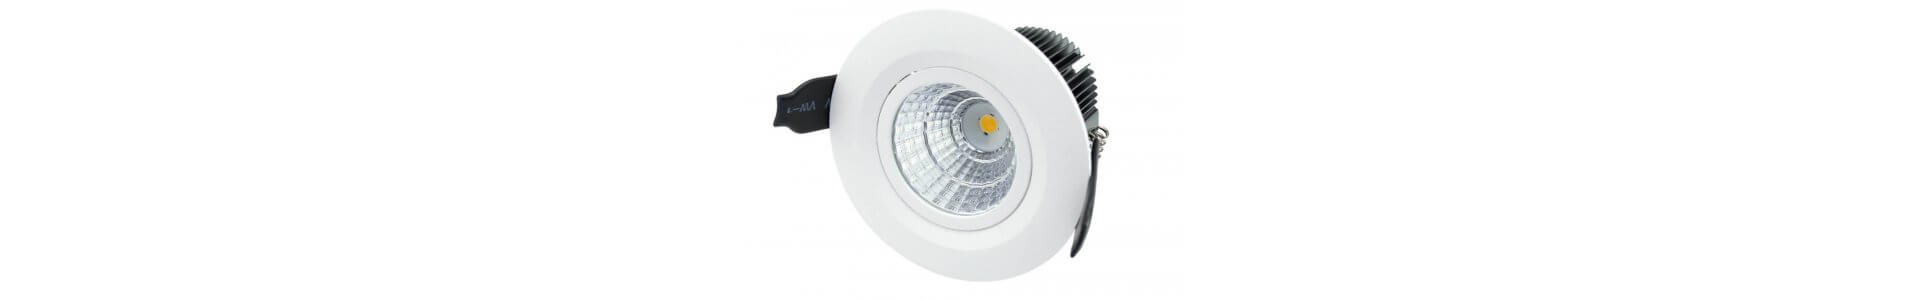 1-3w Led spotlights